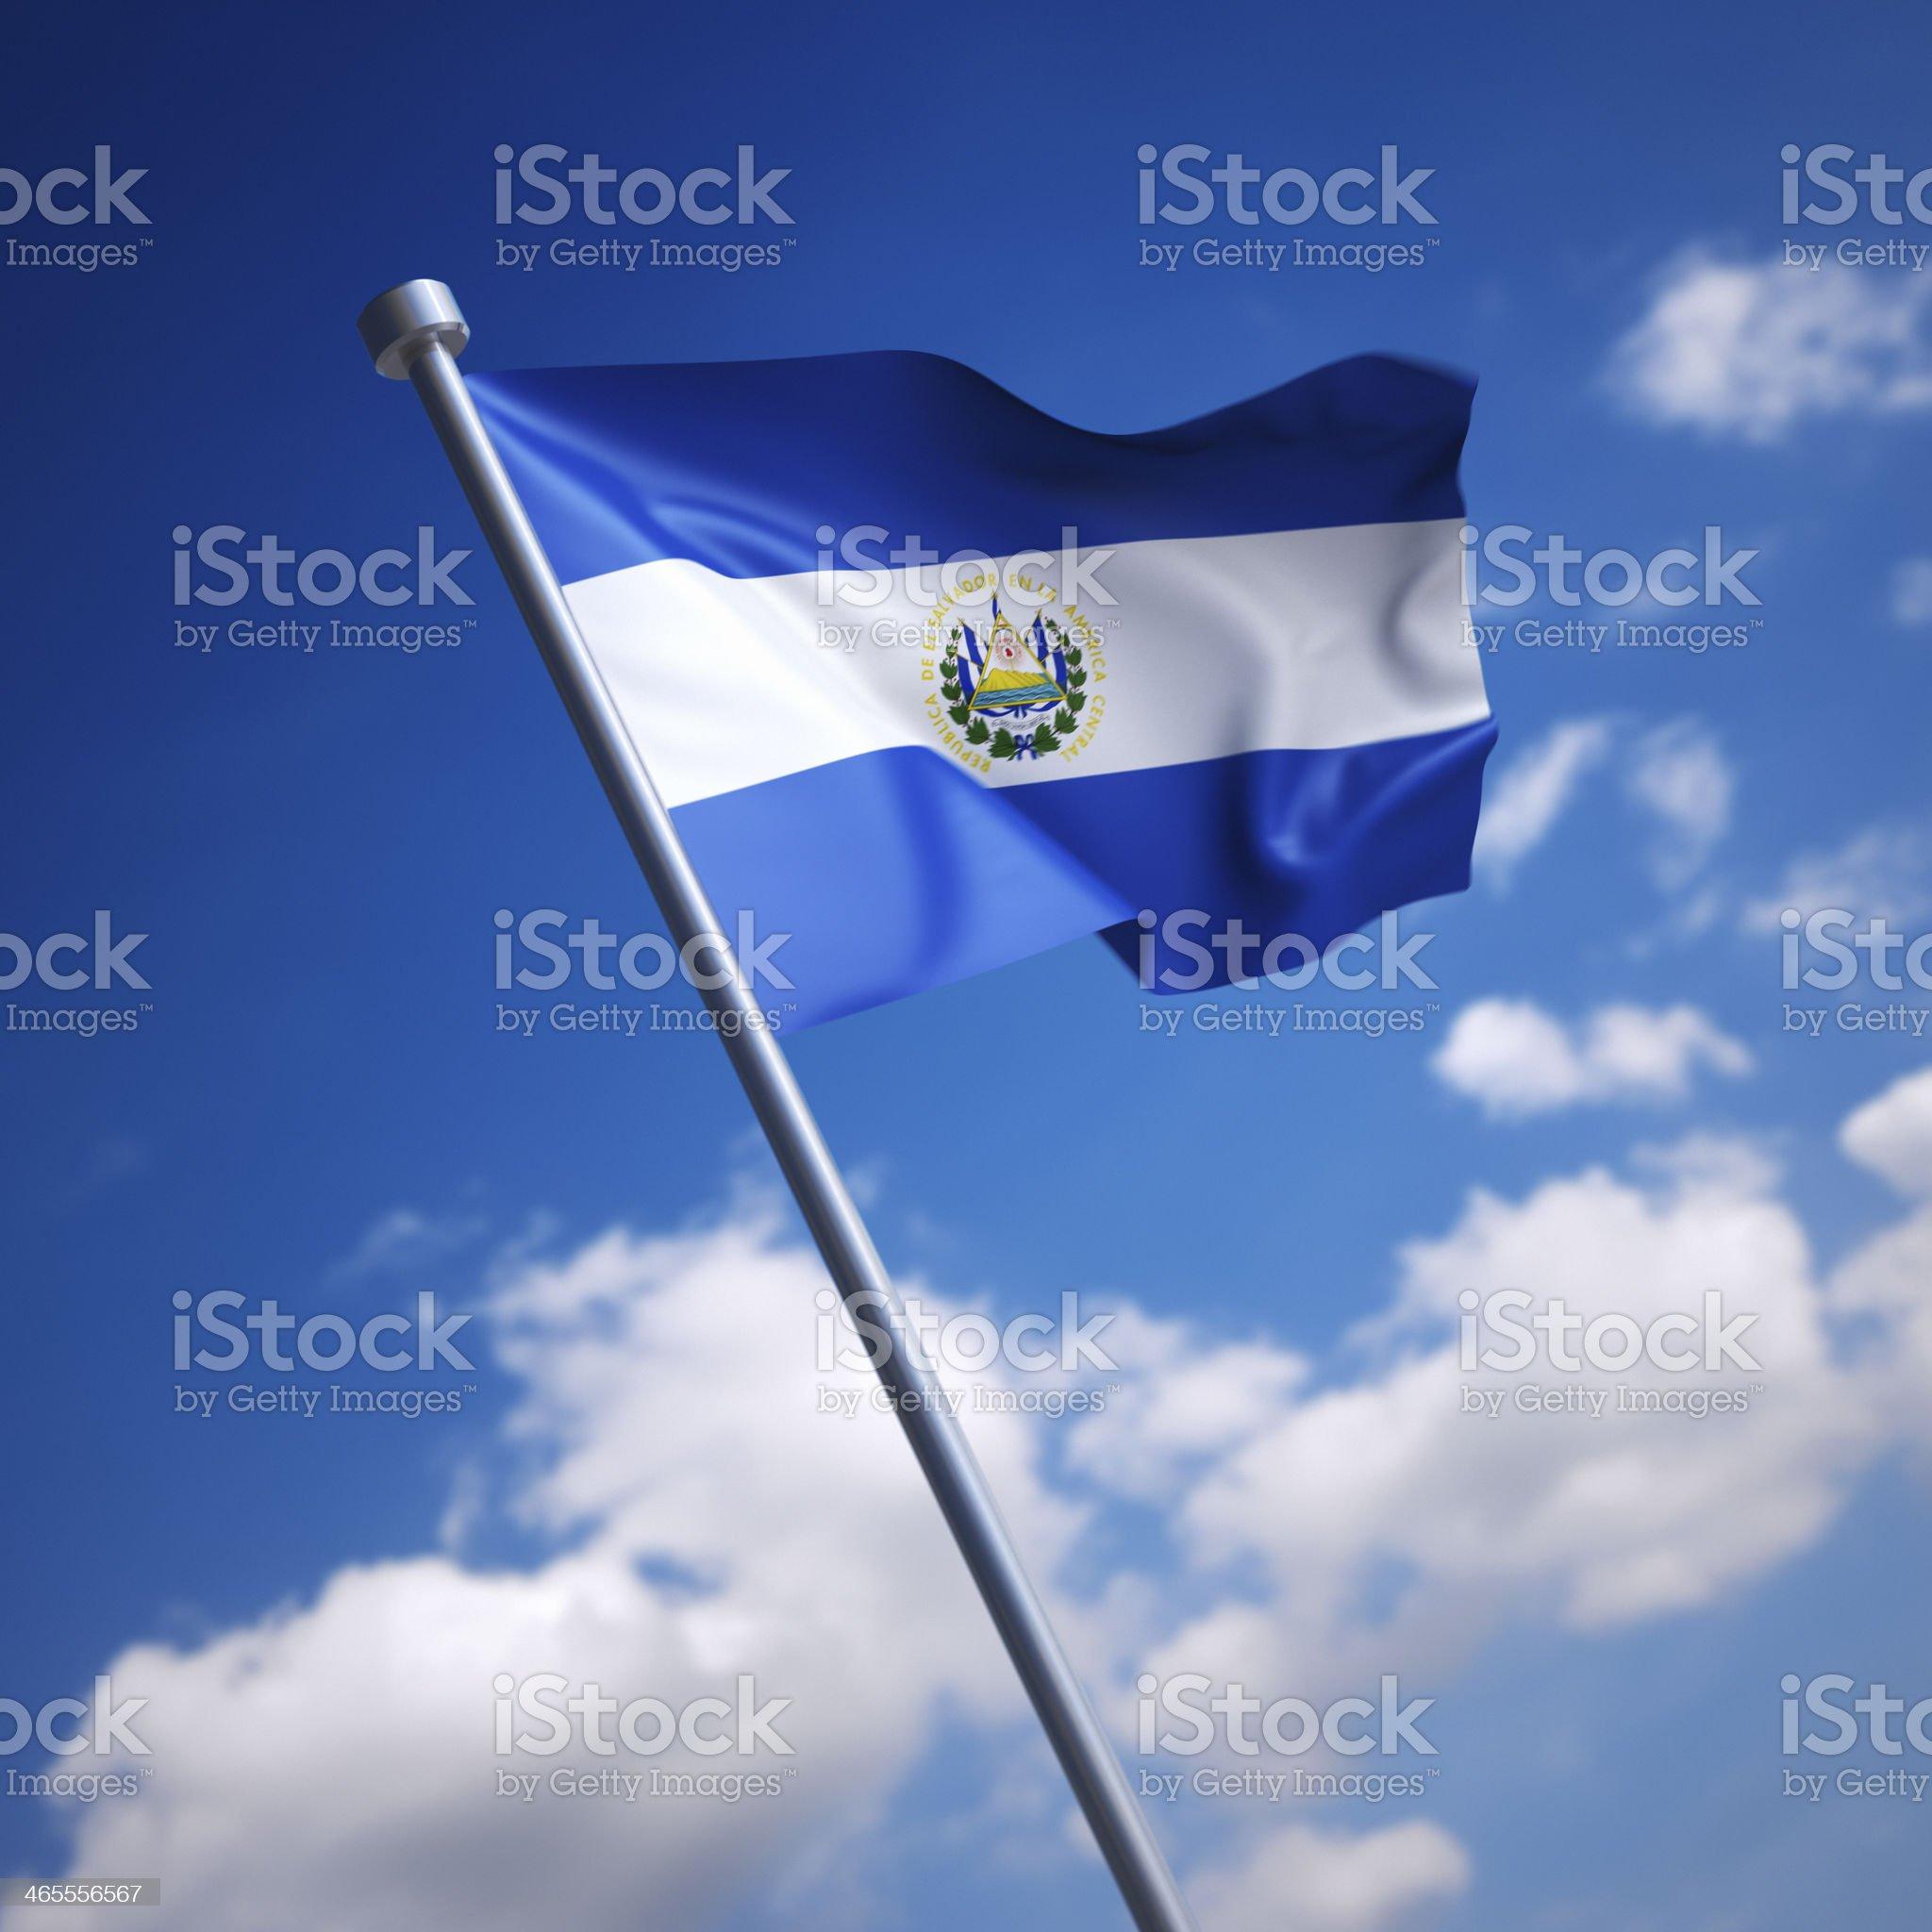 Flag of El Salvador against blue sky royalty-free stock photo